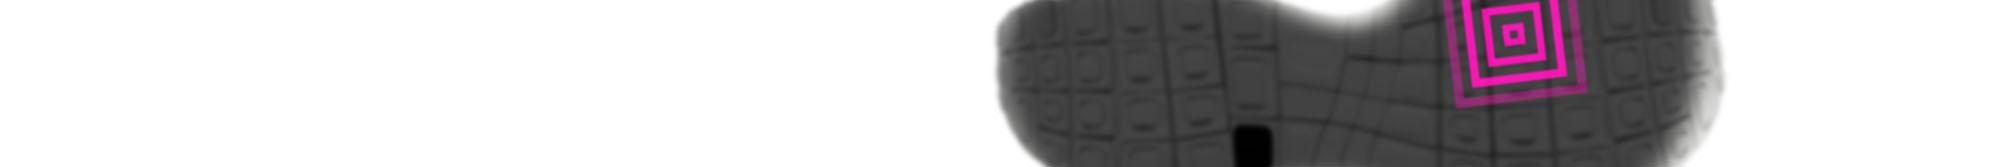 NTC_Design_R2_FullRes_F01.jpg